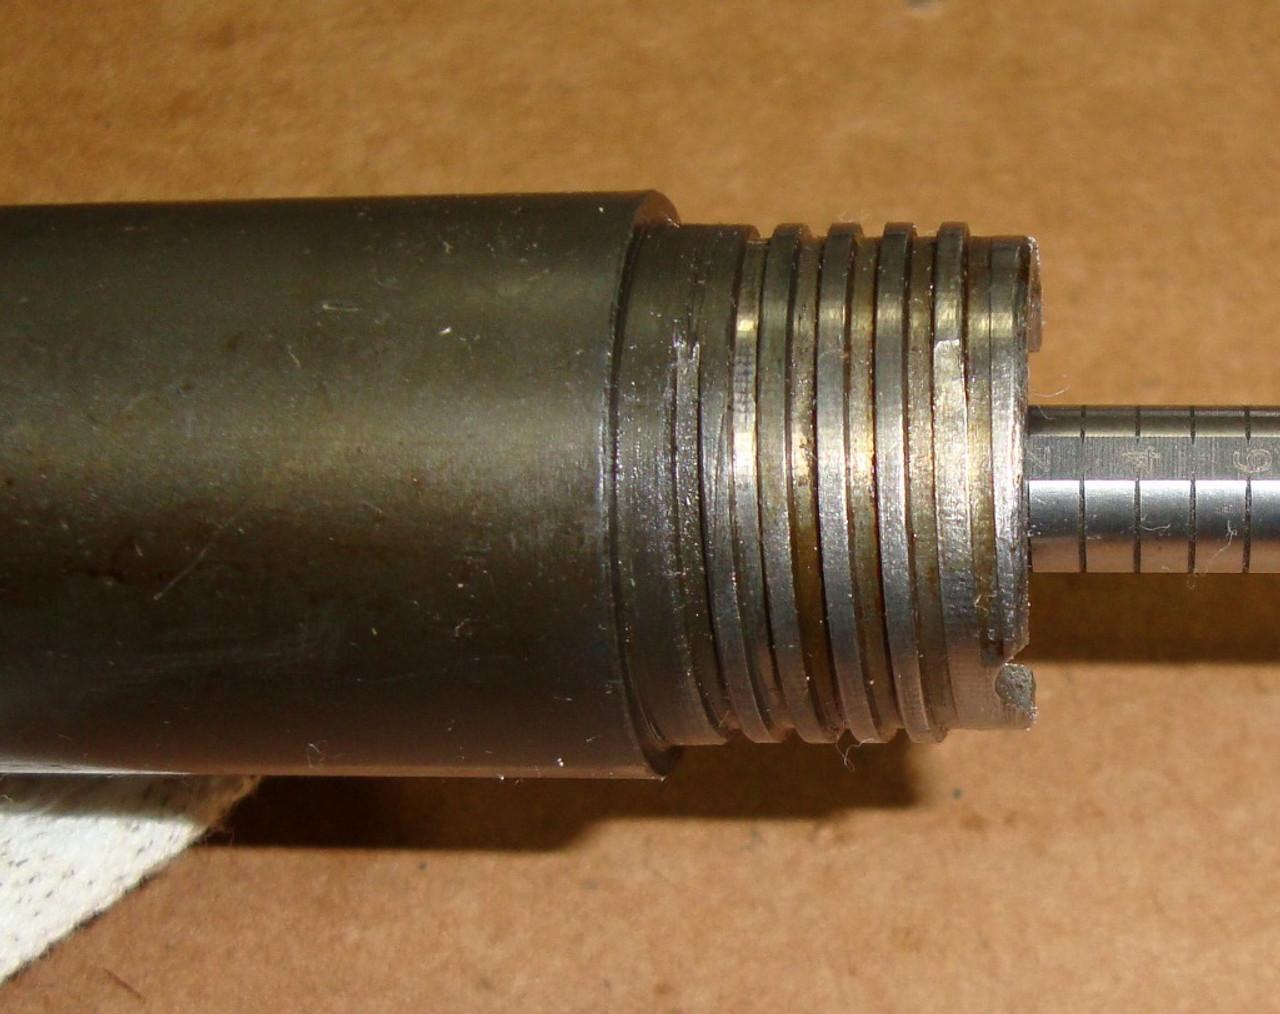 M1 Garand Barrel Springfield  July 1951 <br>ME 0.1 TE 2